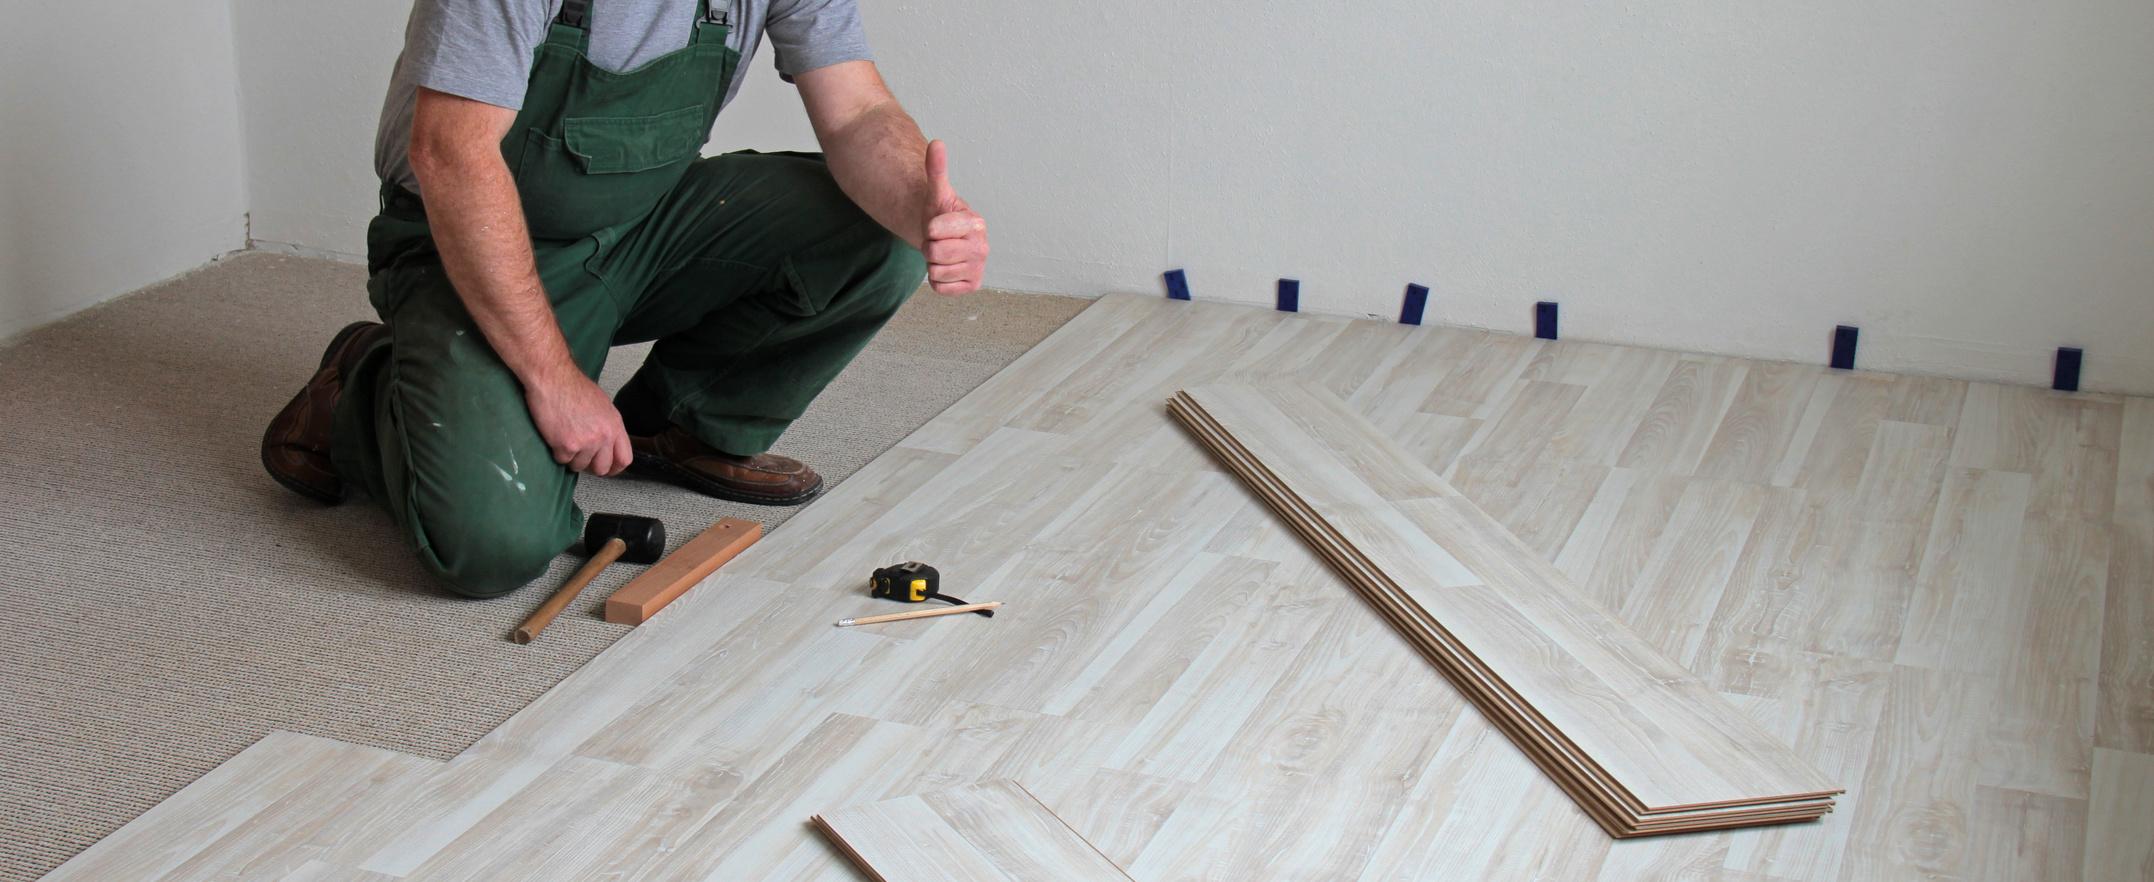 Flooring installation in a Murray, UT home